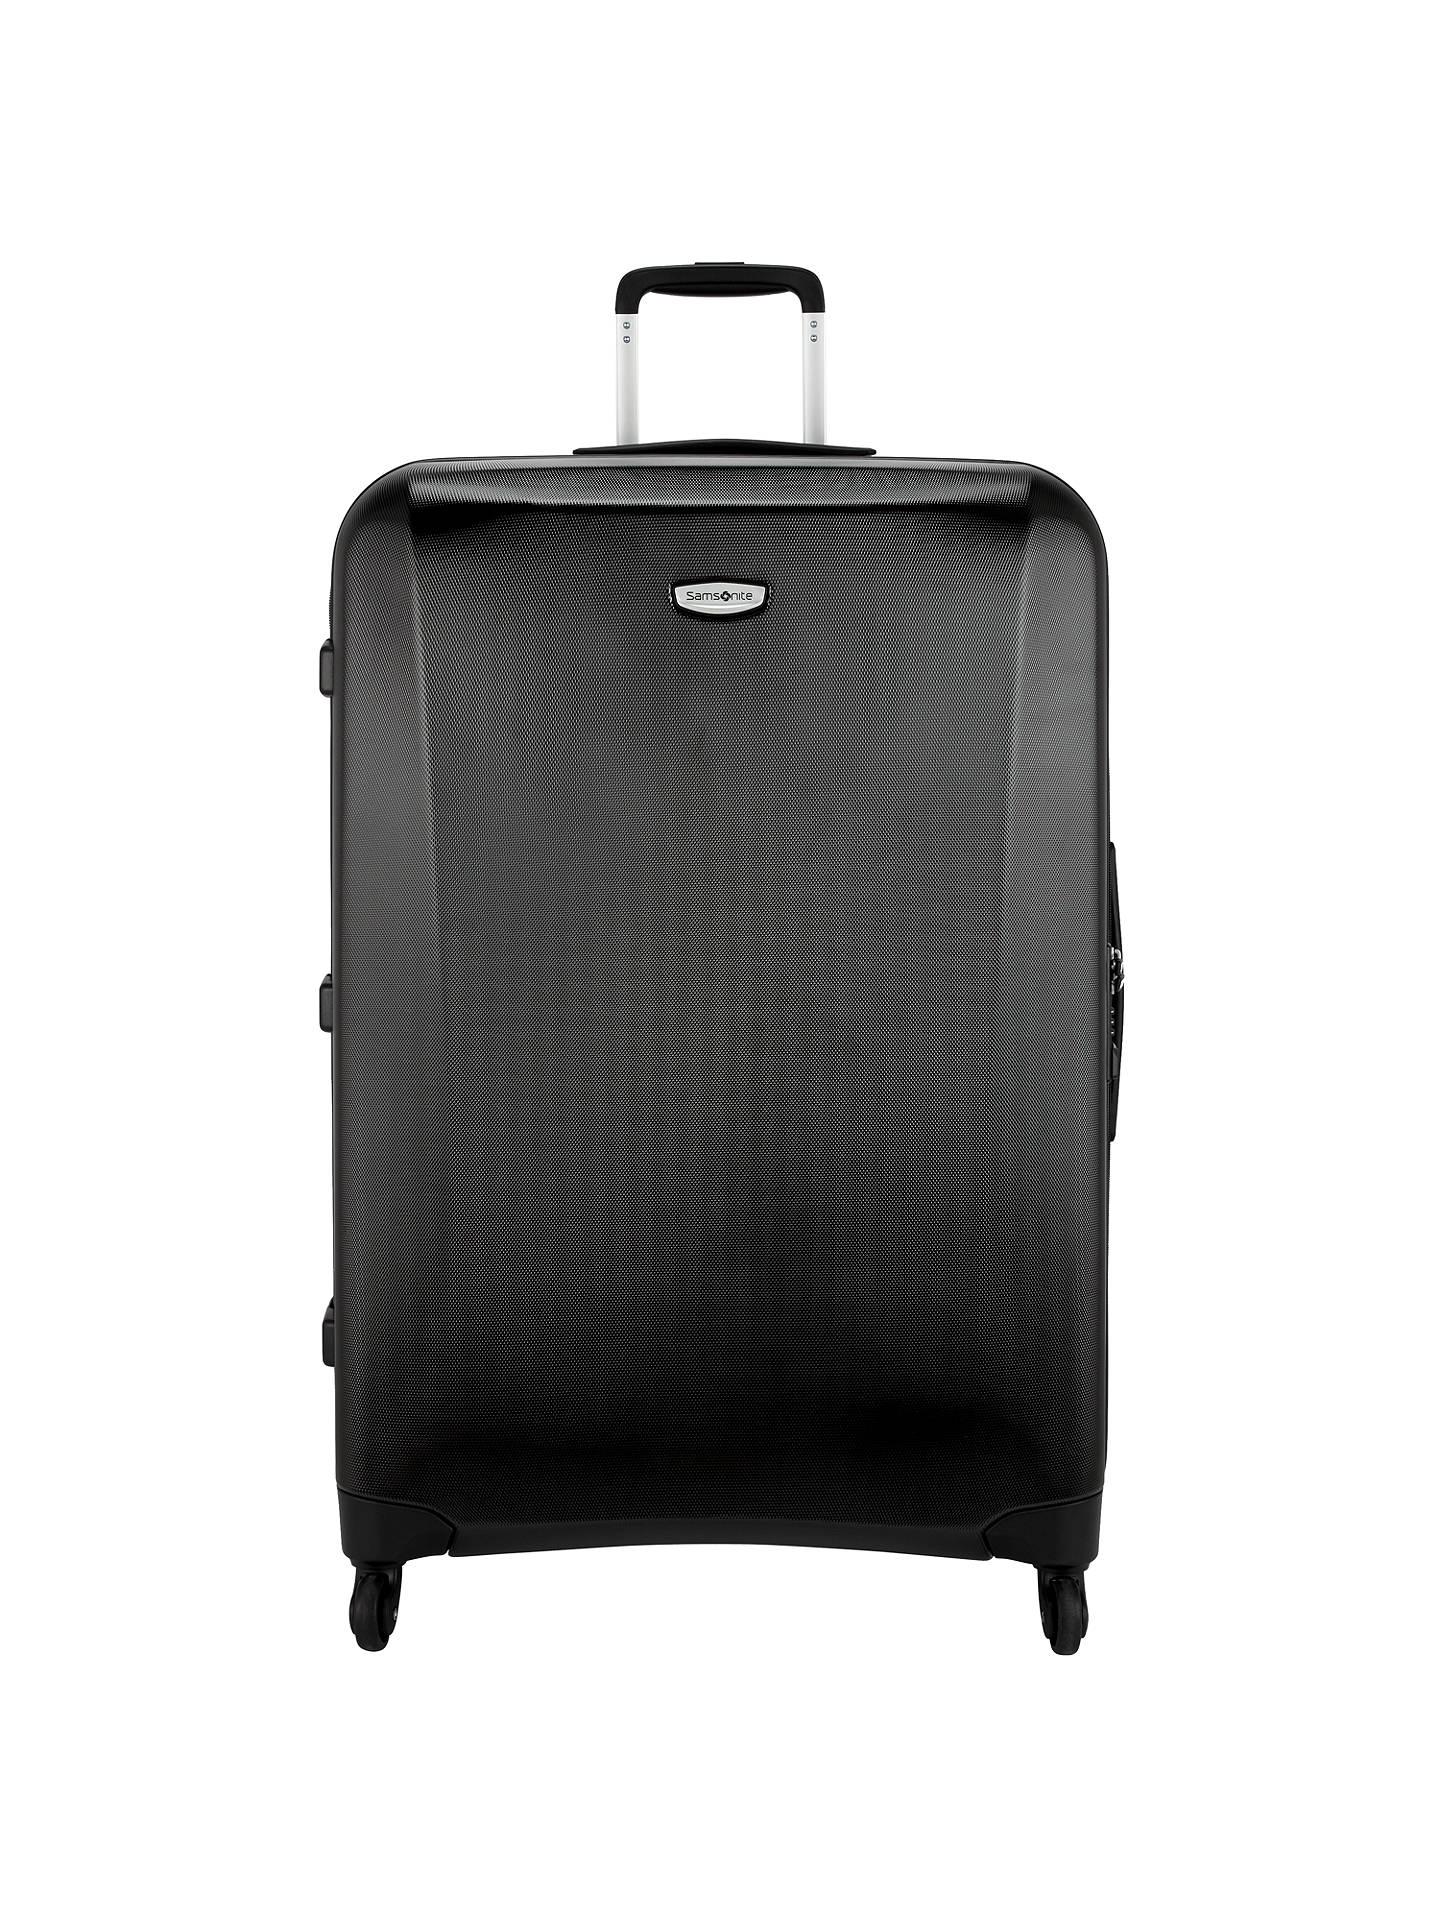 b1c346e57 Buy Samsonite Klassik 82cm 4-Wheel Spinner Suitcase, Black Online at  johnlewis.com ...